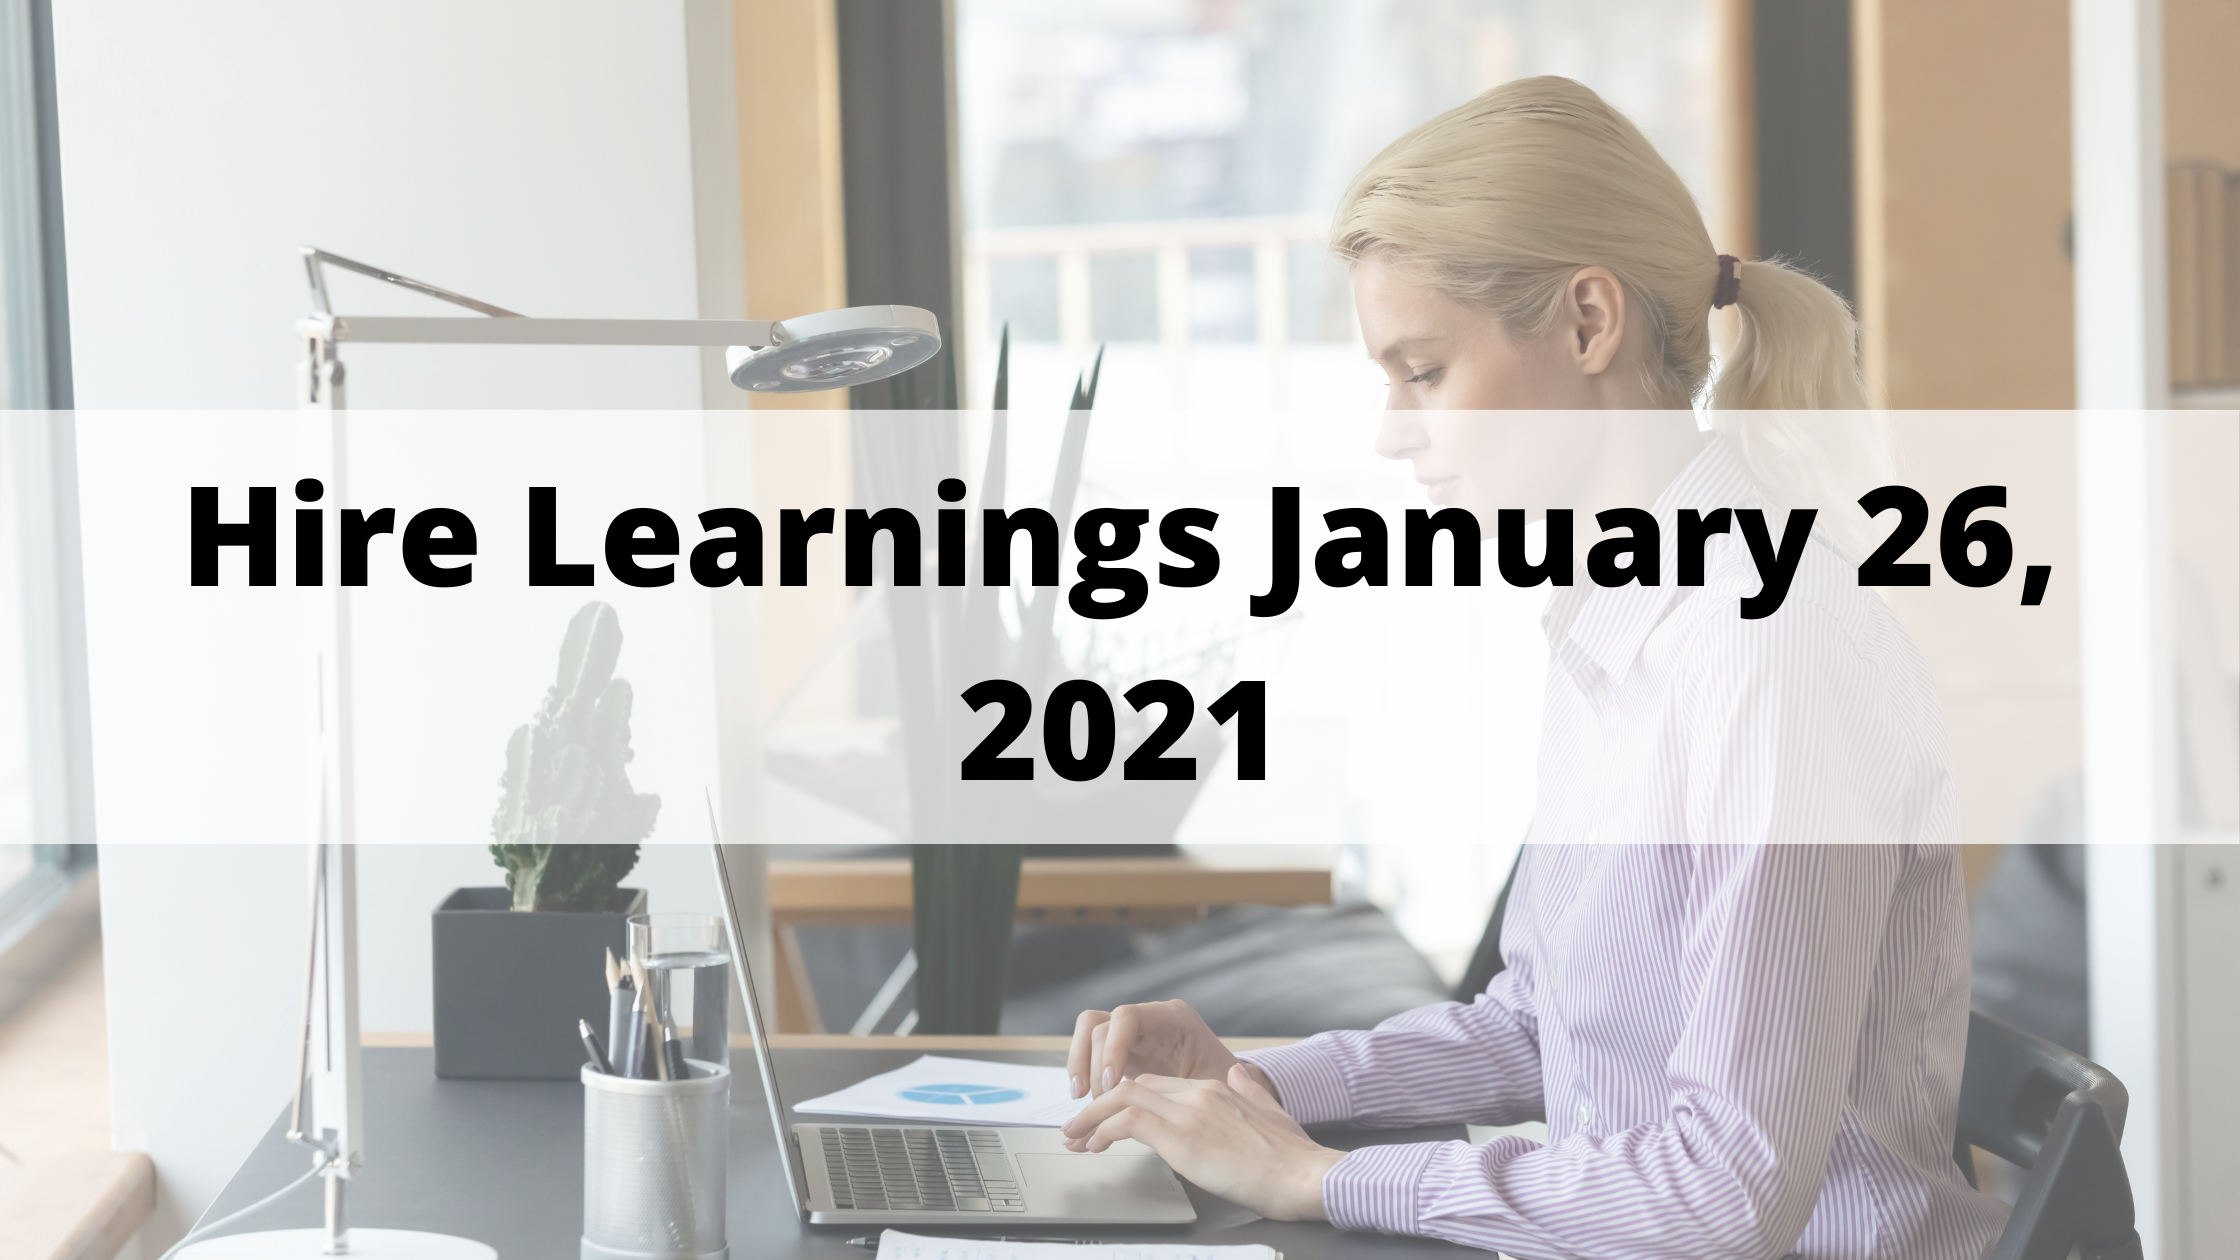 Hire Learnings January 26, 2021